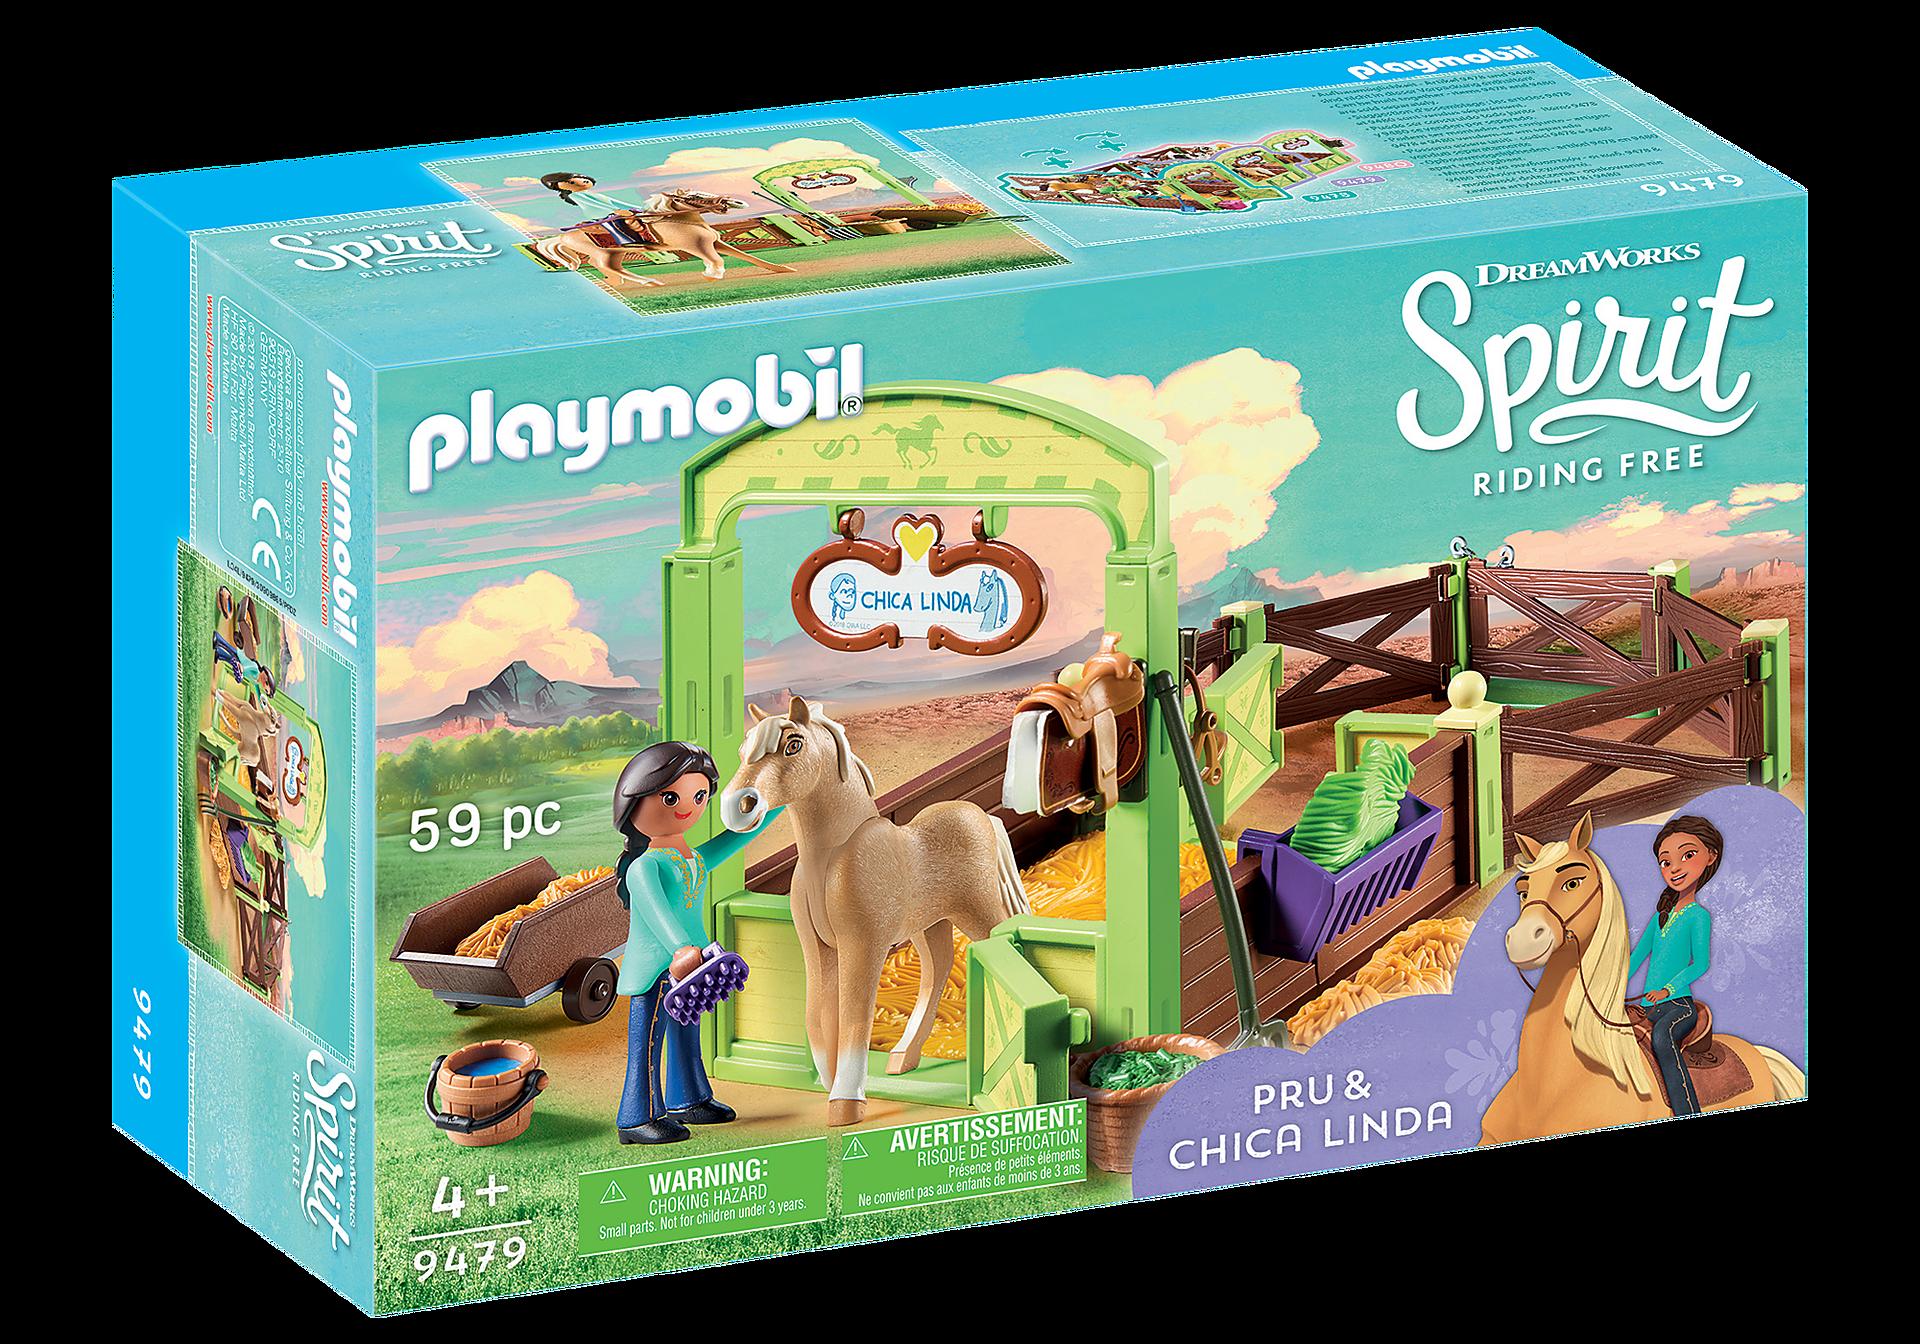 http://media.playmobil.com/i/playmobil/9479_product_box_front/Pru & Chica Linda met paardenbox